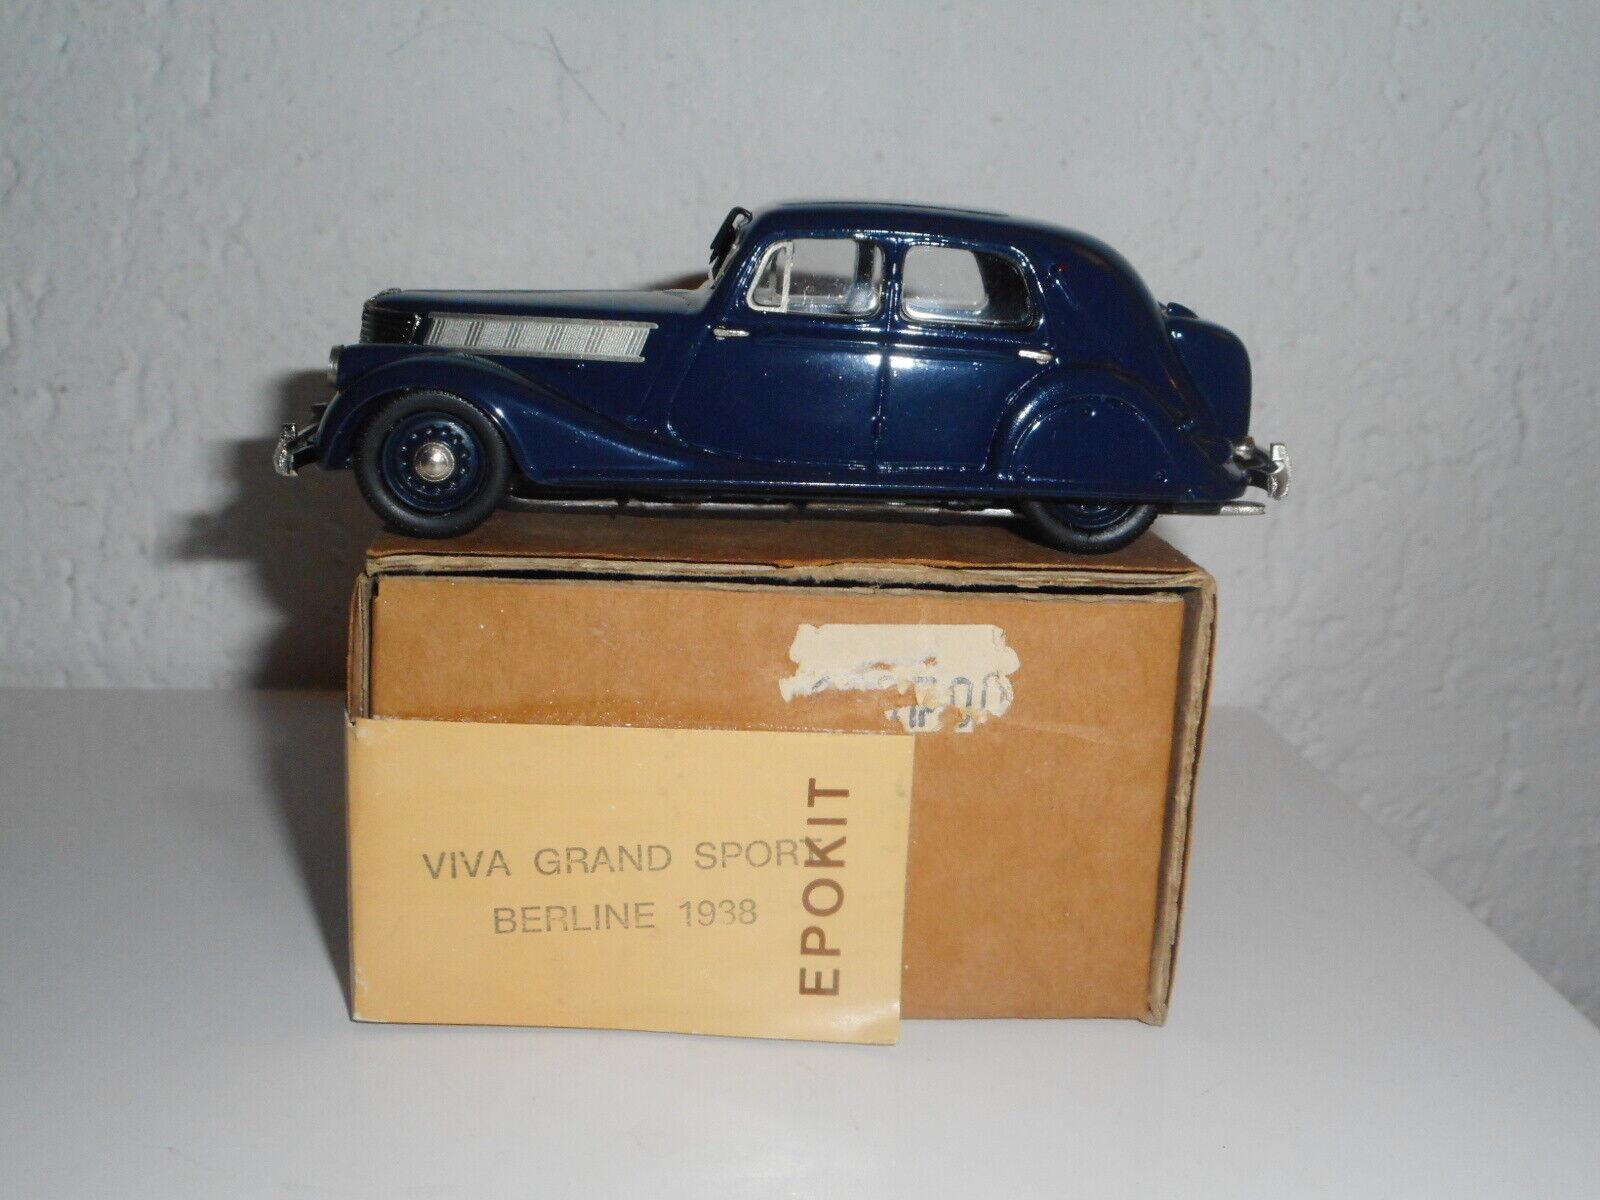 BELLE EPOQUE  RENAULT VIVA GRAND SPORT  berline 1 43 résine vintage